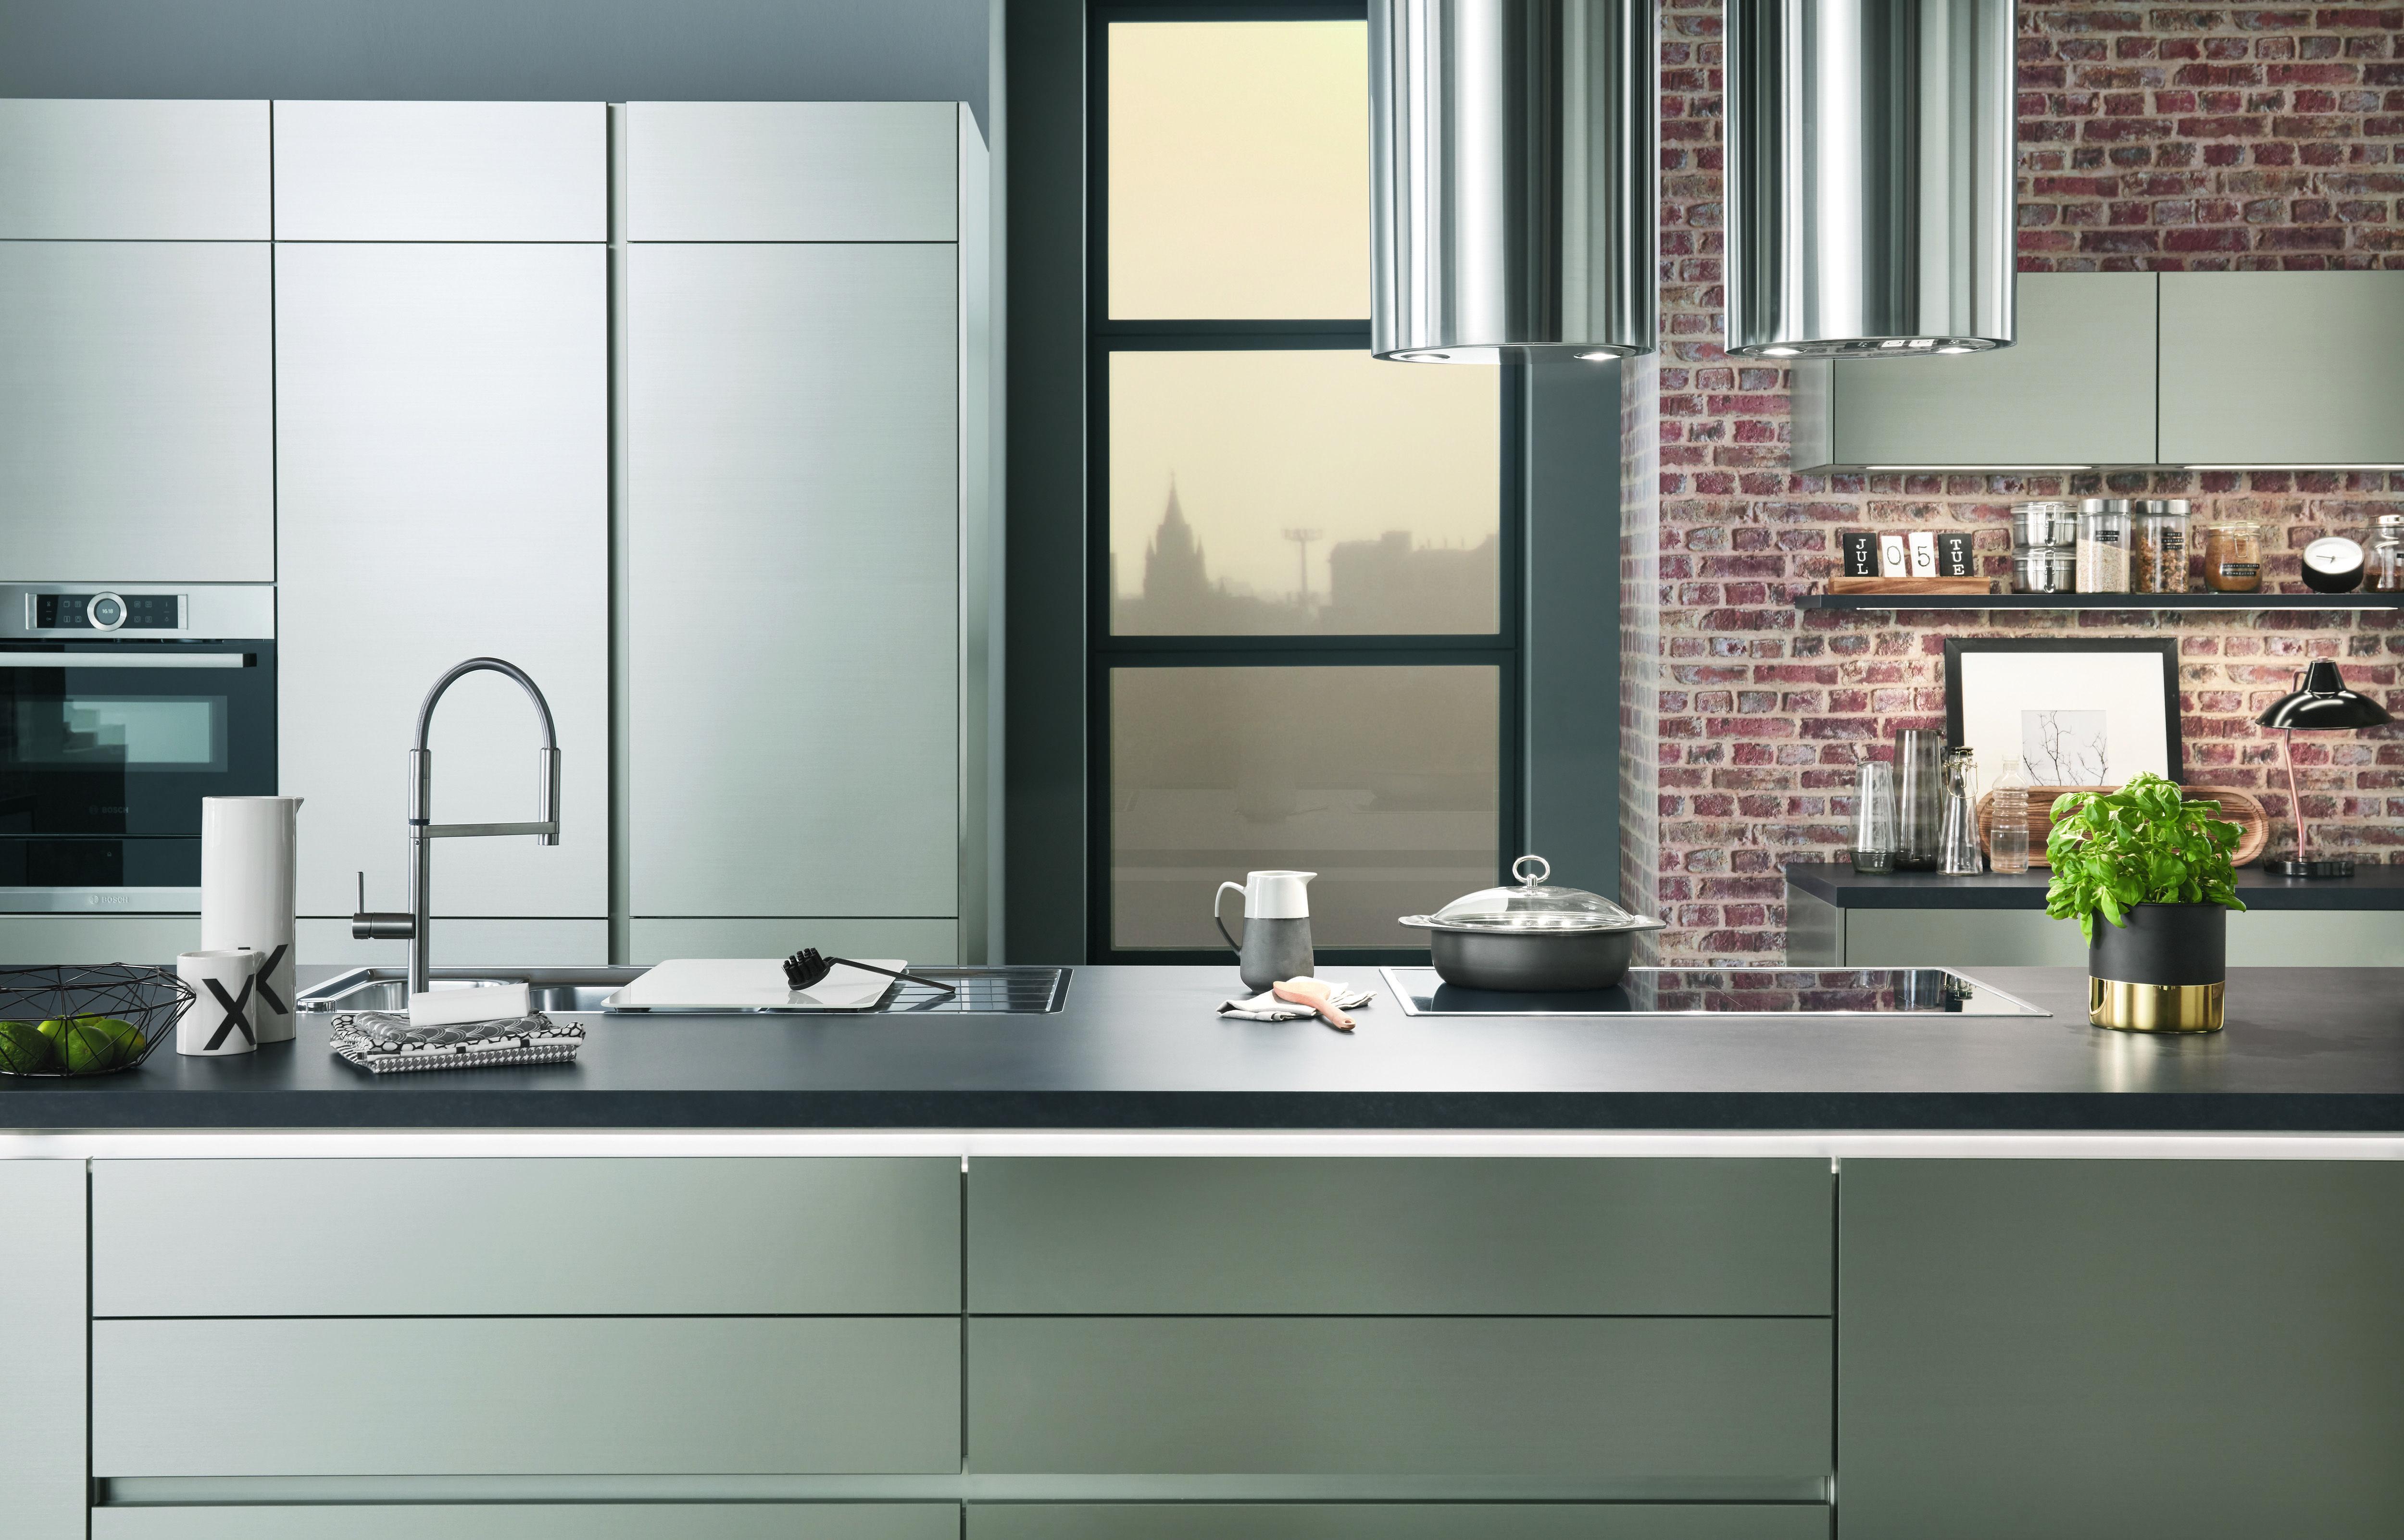 Handless Kitchens Handleless Kitchen Modern Kitchen Design Handless Kitchen